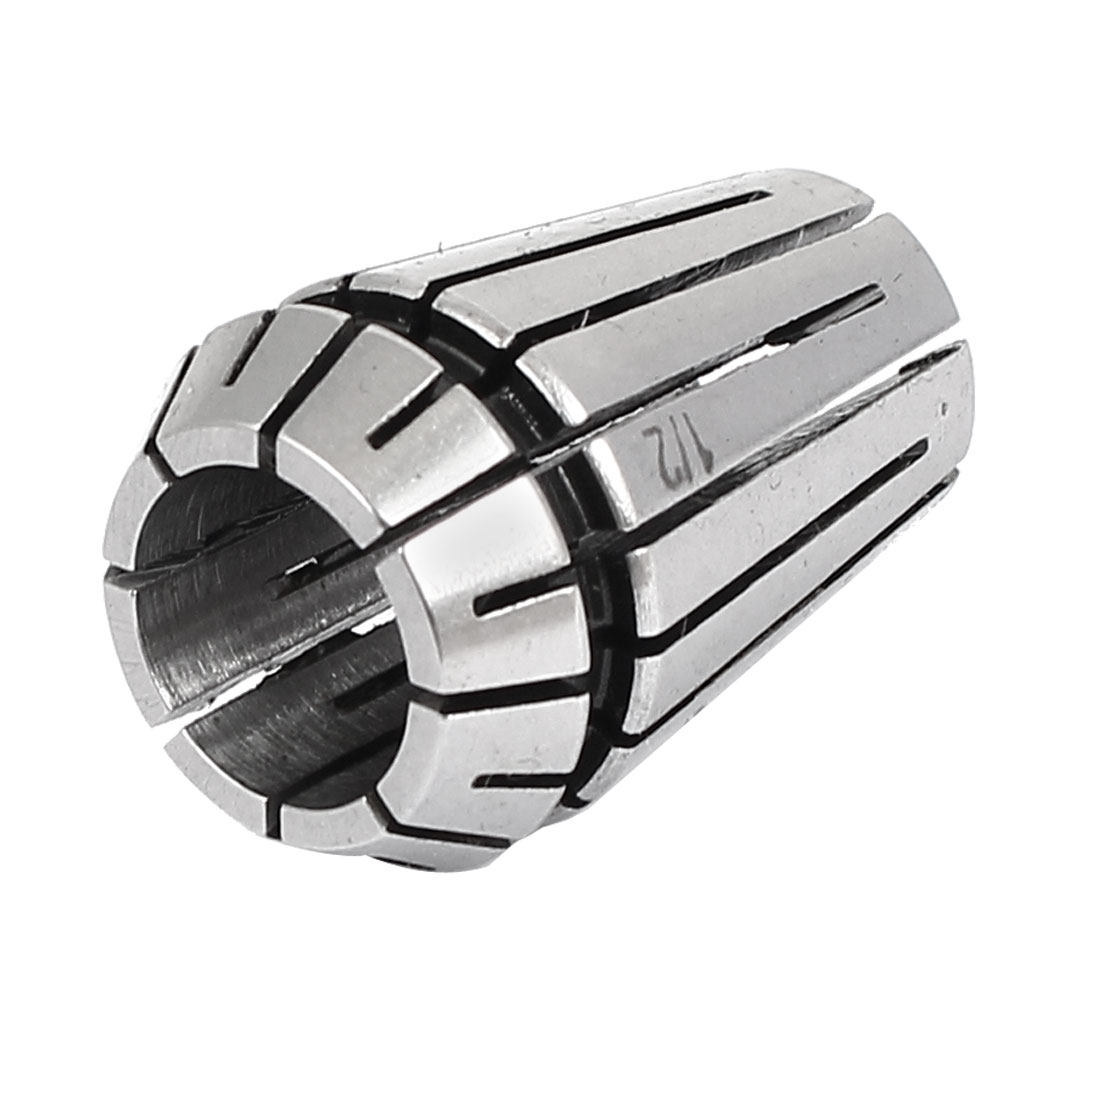 "ER20 1/2"" Clamping Dia CNC Engraving Milling Machine Spring Collet"